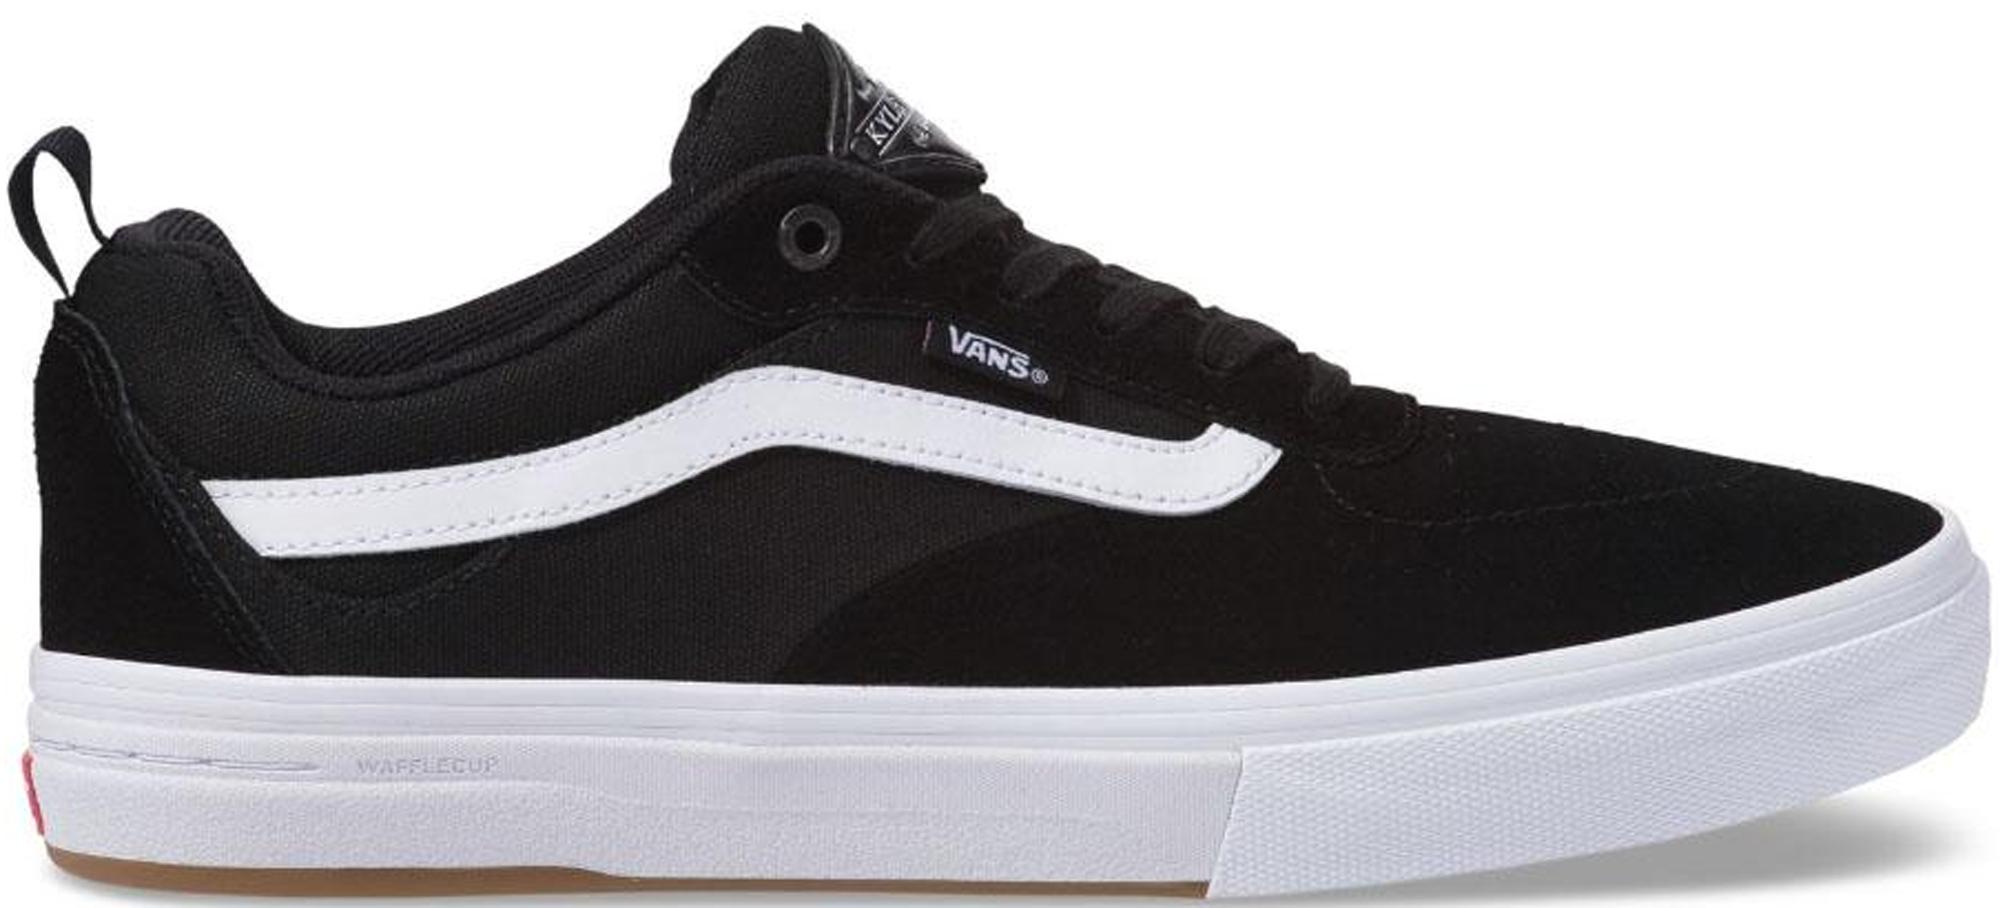 Vans Kyle Walker Pro Black White